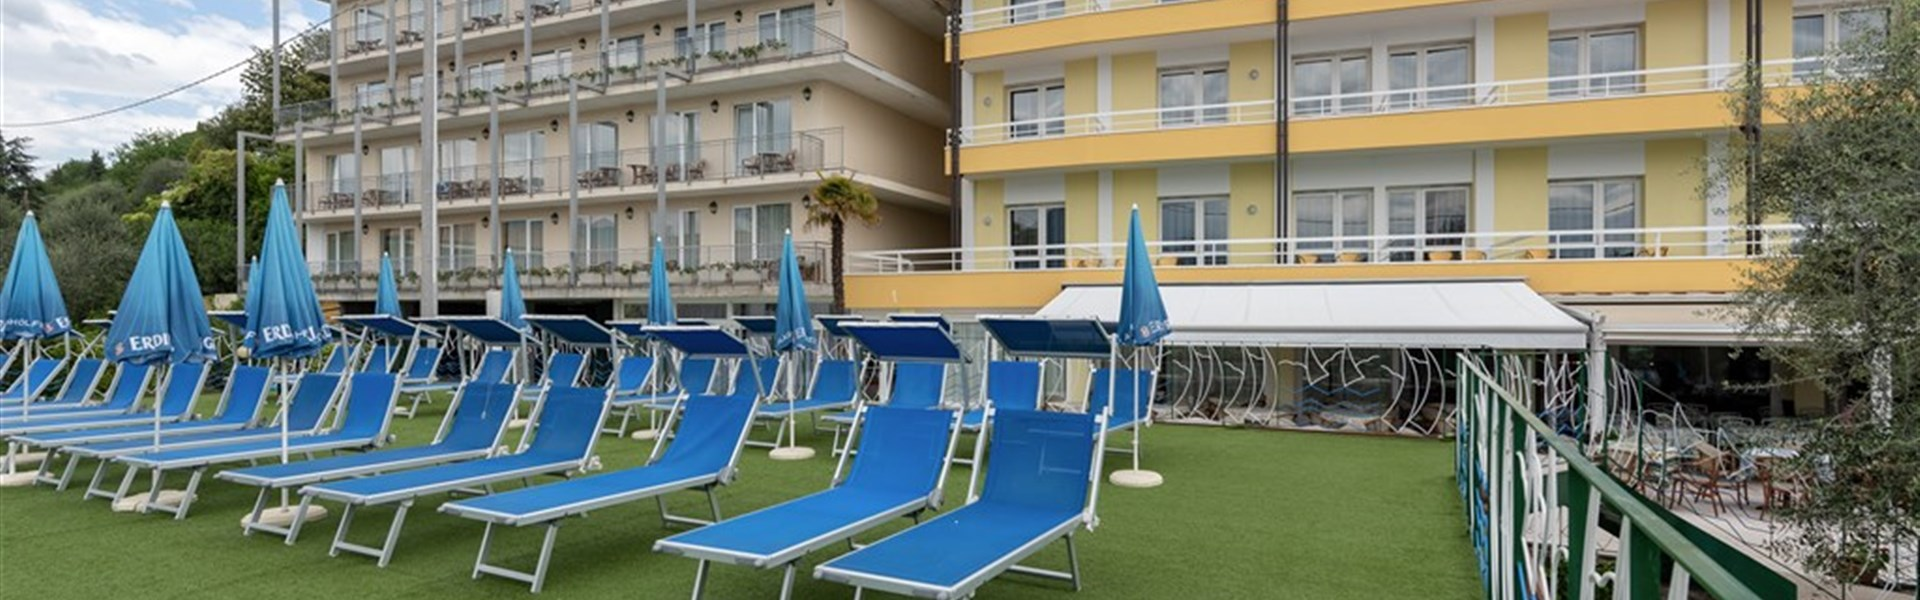 Hotel Internazionale -